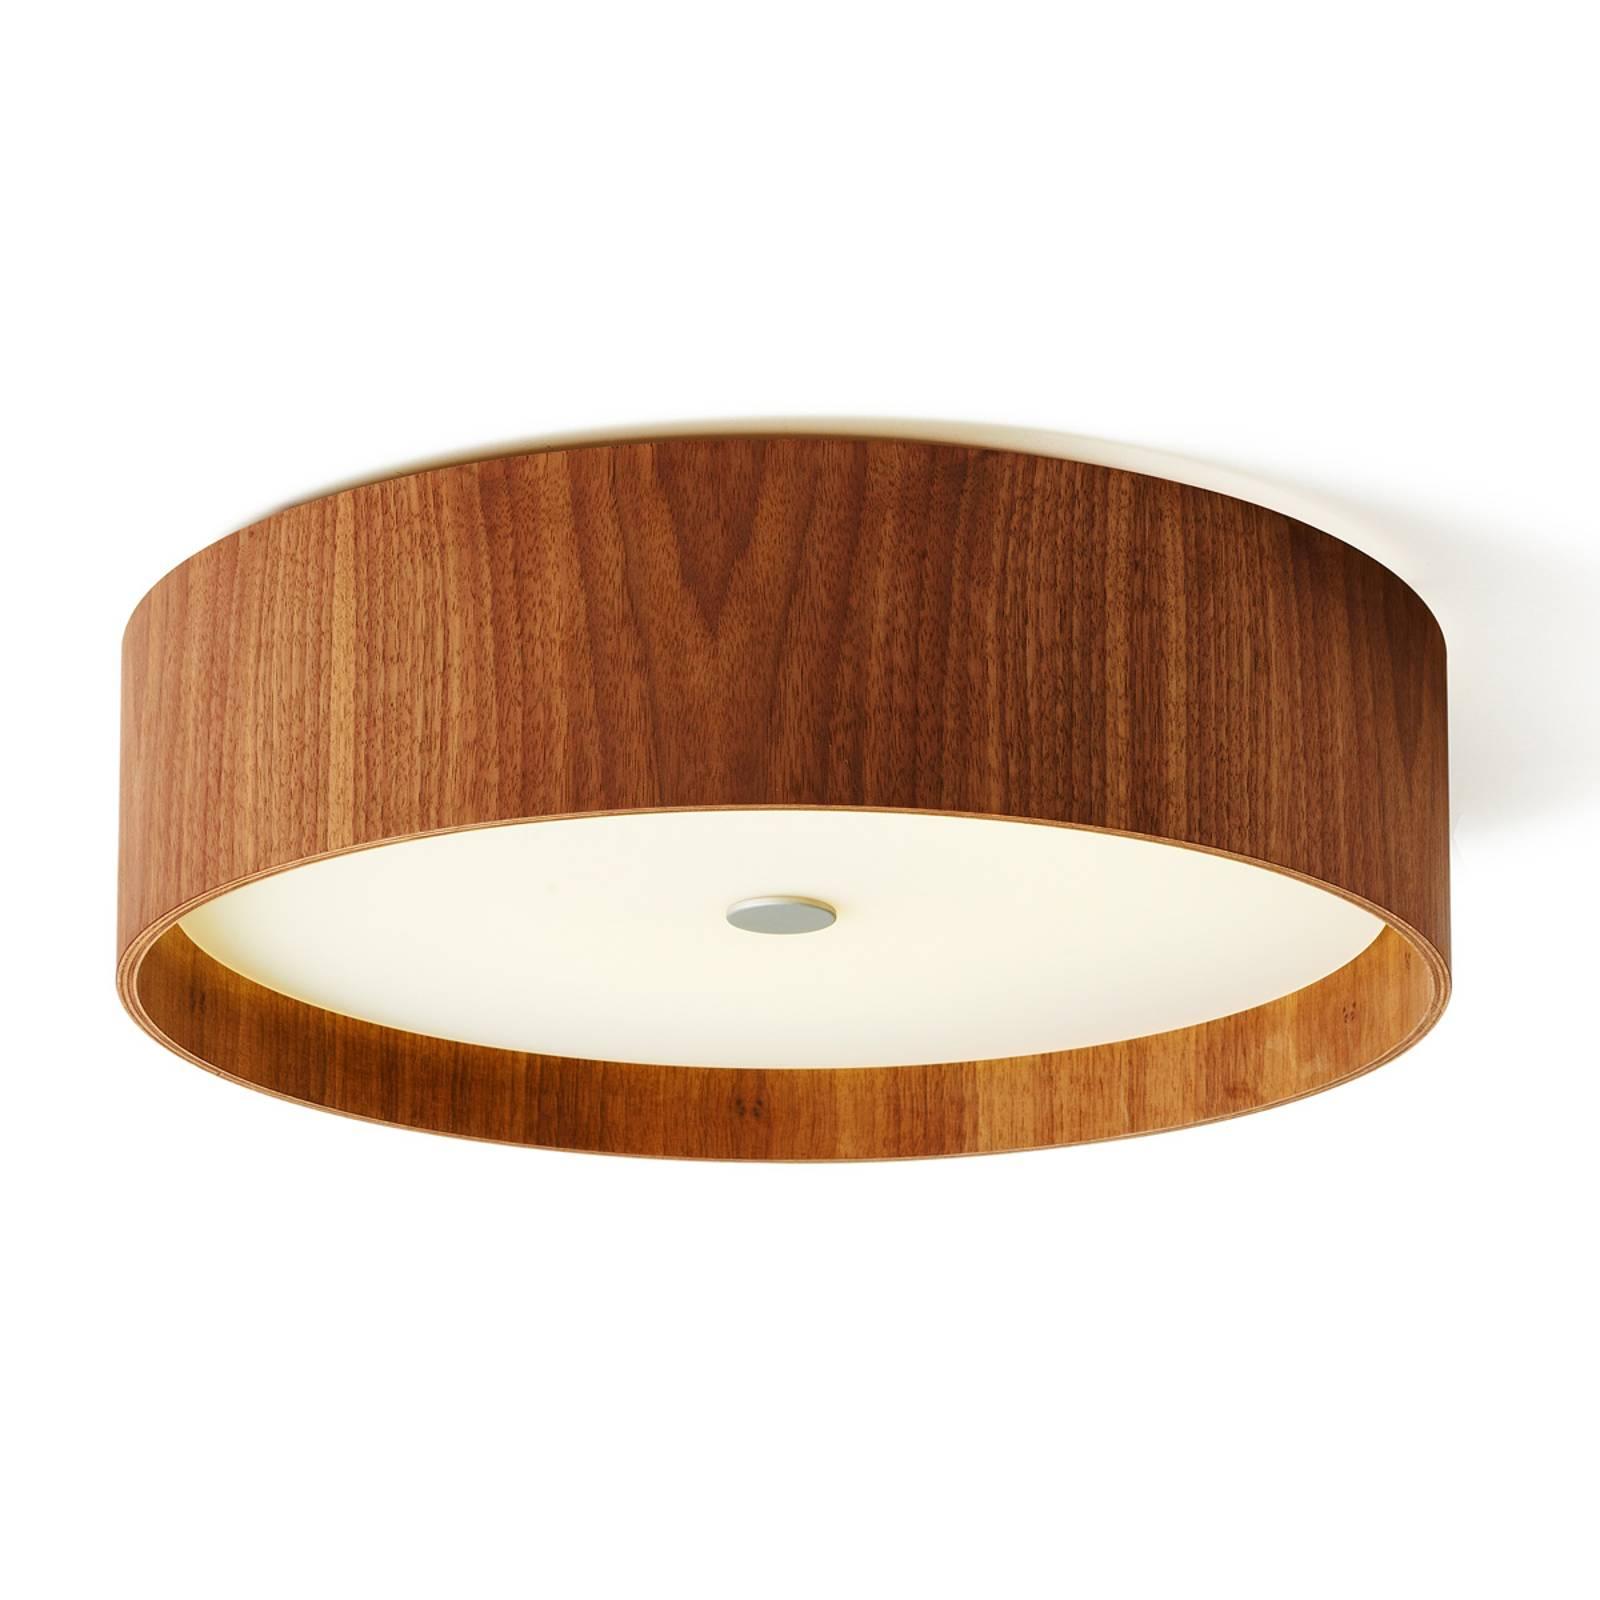 Notenhouten plafondlamp Lara wood met LED, 43 cm